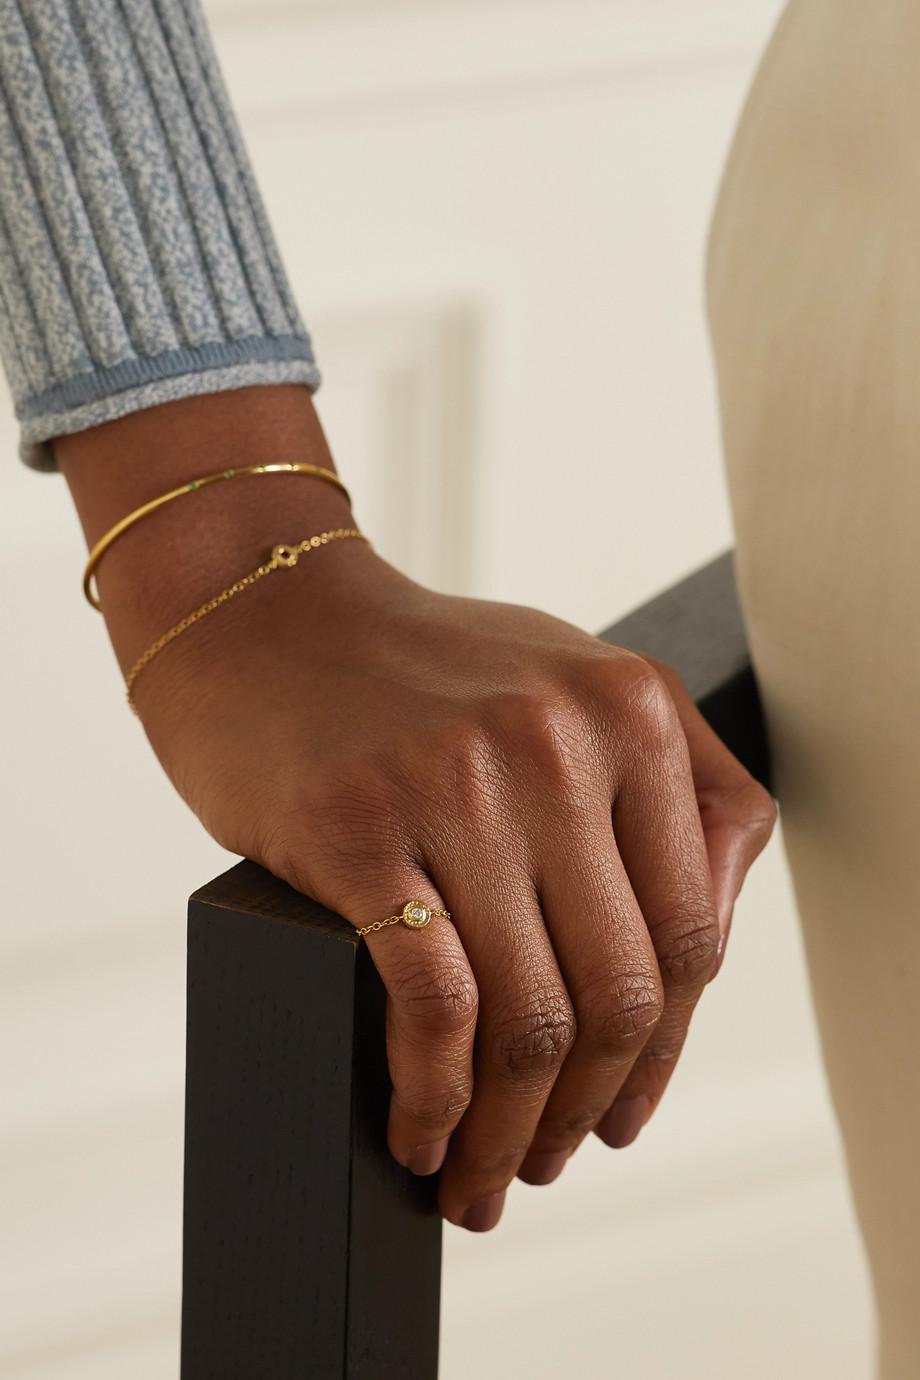 Octavia Elizabeth + NET SUSTAIN Nesting Gem 18-karat recycled gold diamond ring